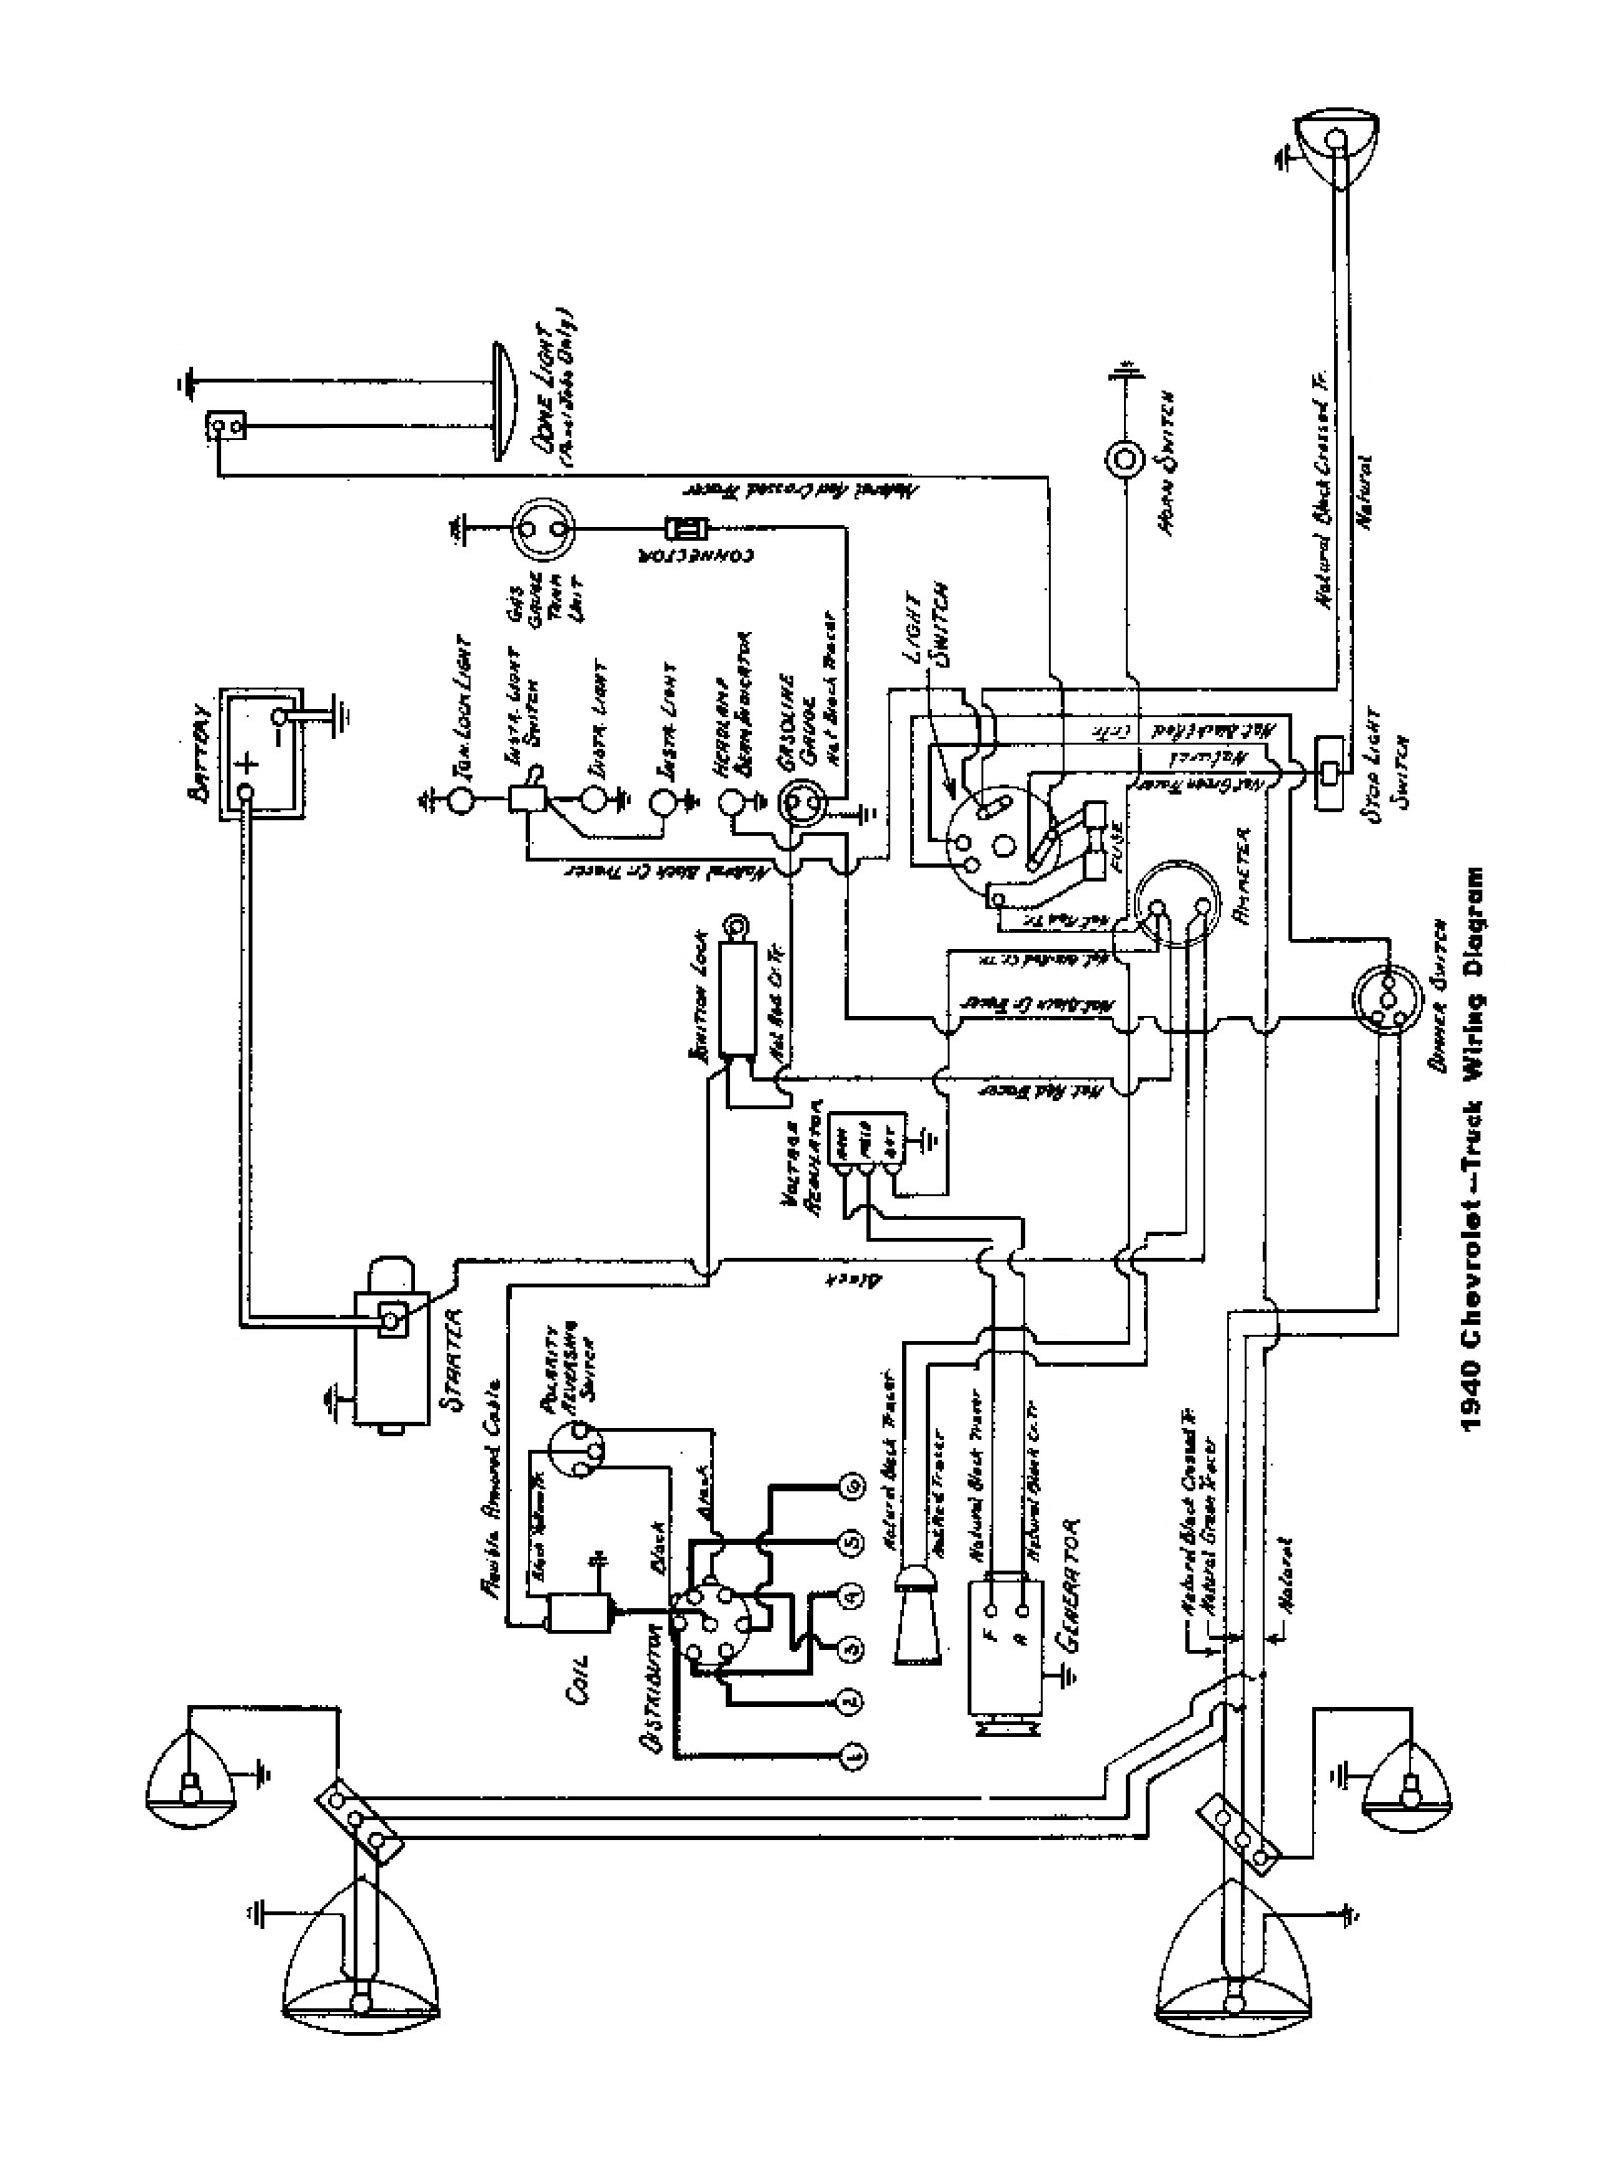 Chevrolet Truck Wiring Diagrams Truck Wiring Schematics Wiring Diagram Paper Of Chevrolet Truck Wiring Diagrams